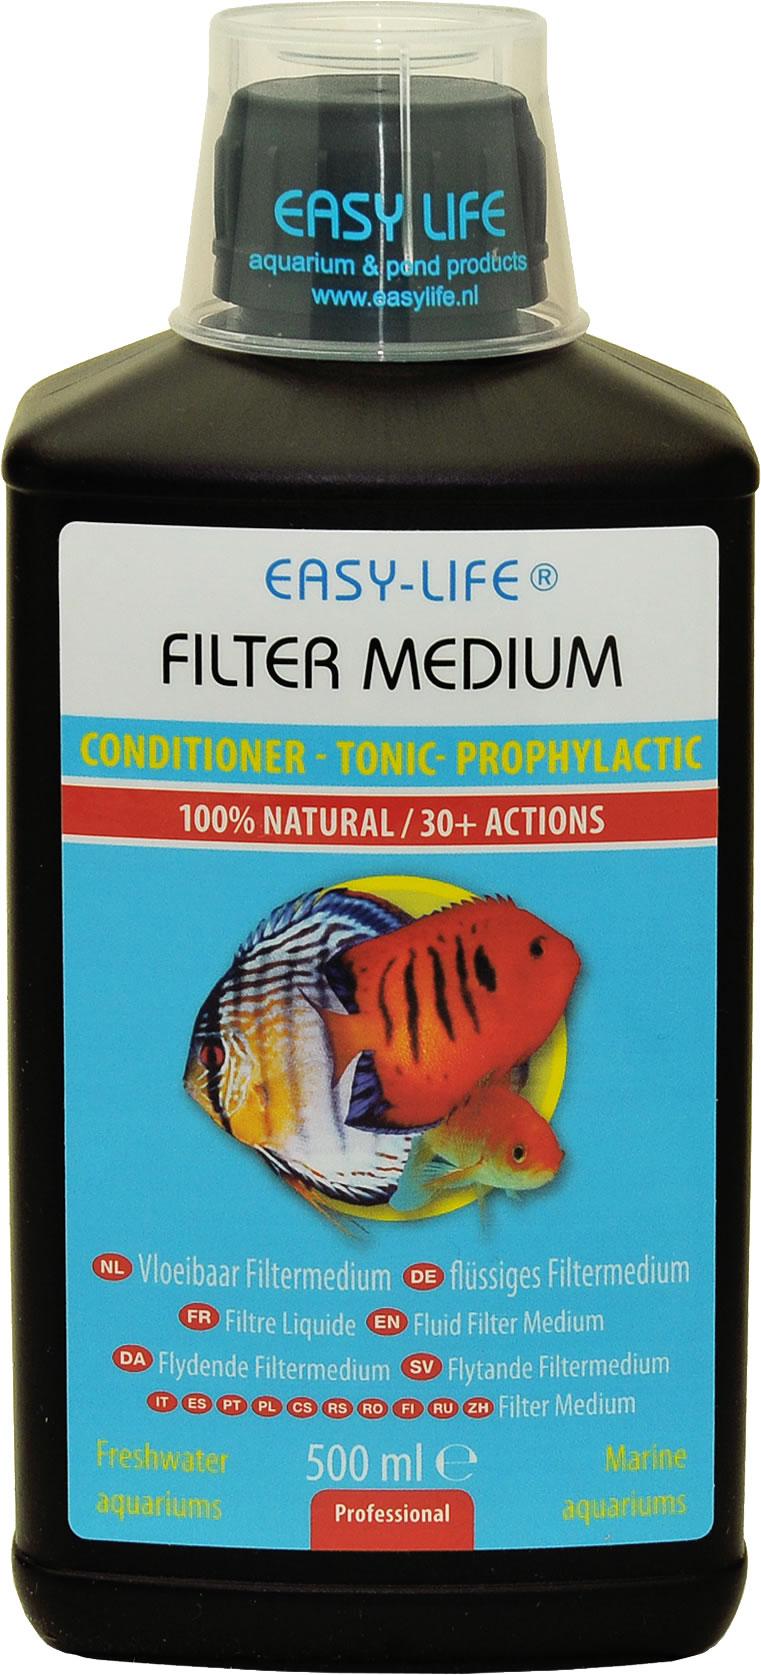 Easy Life FFM Filter Medium 500 ml - broschei